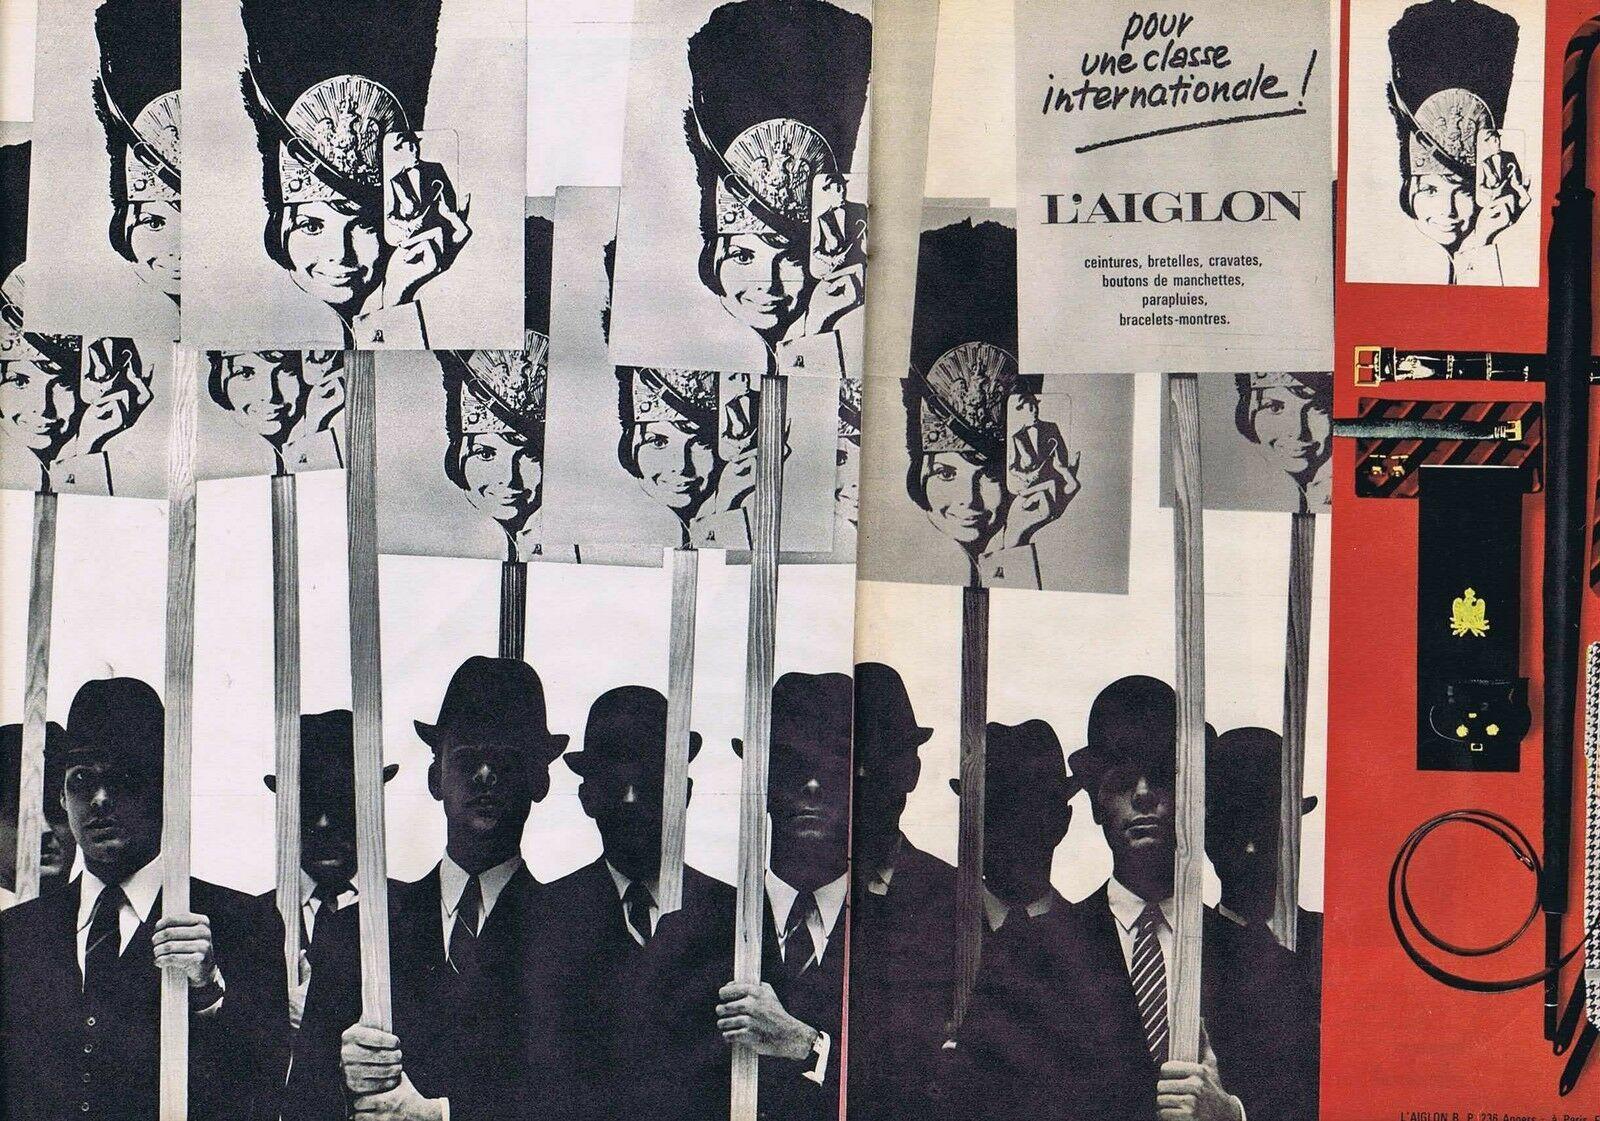 1967 L'Aiglon ceintures bretelles parapluies